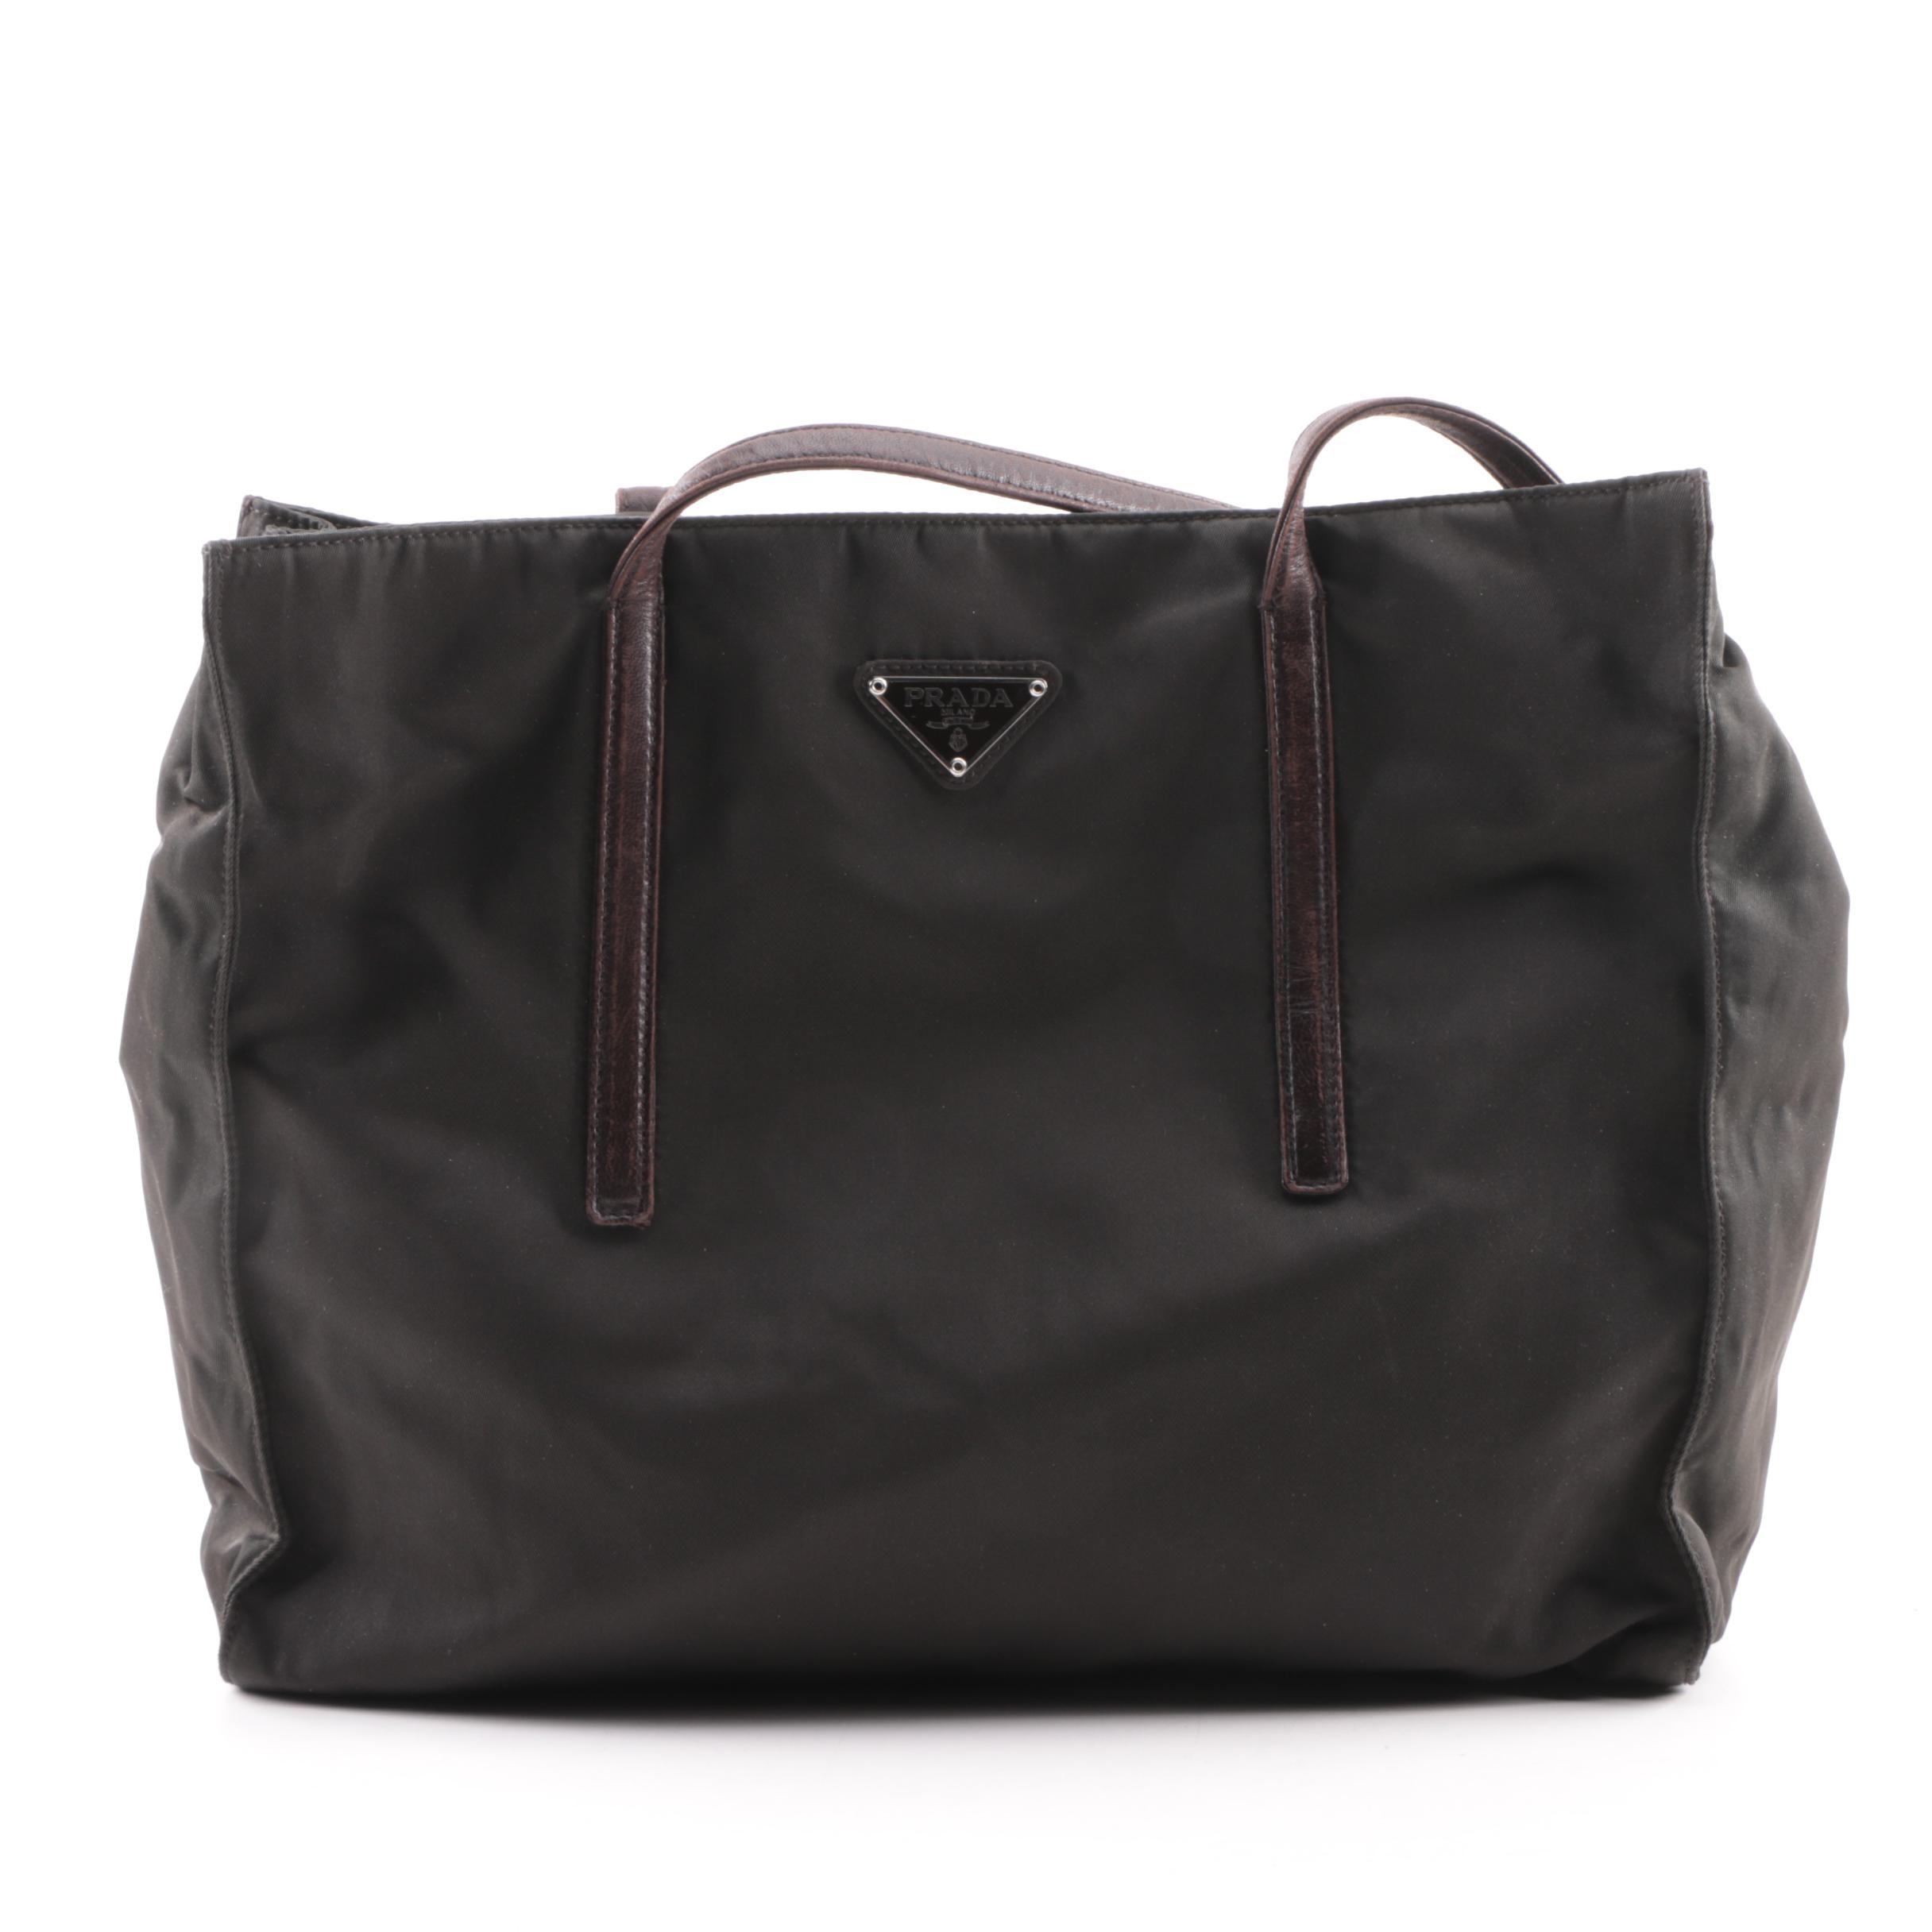 Prada Black Nylon Tote with Brown Leather Straps